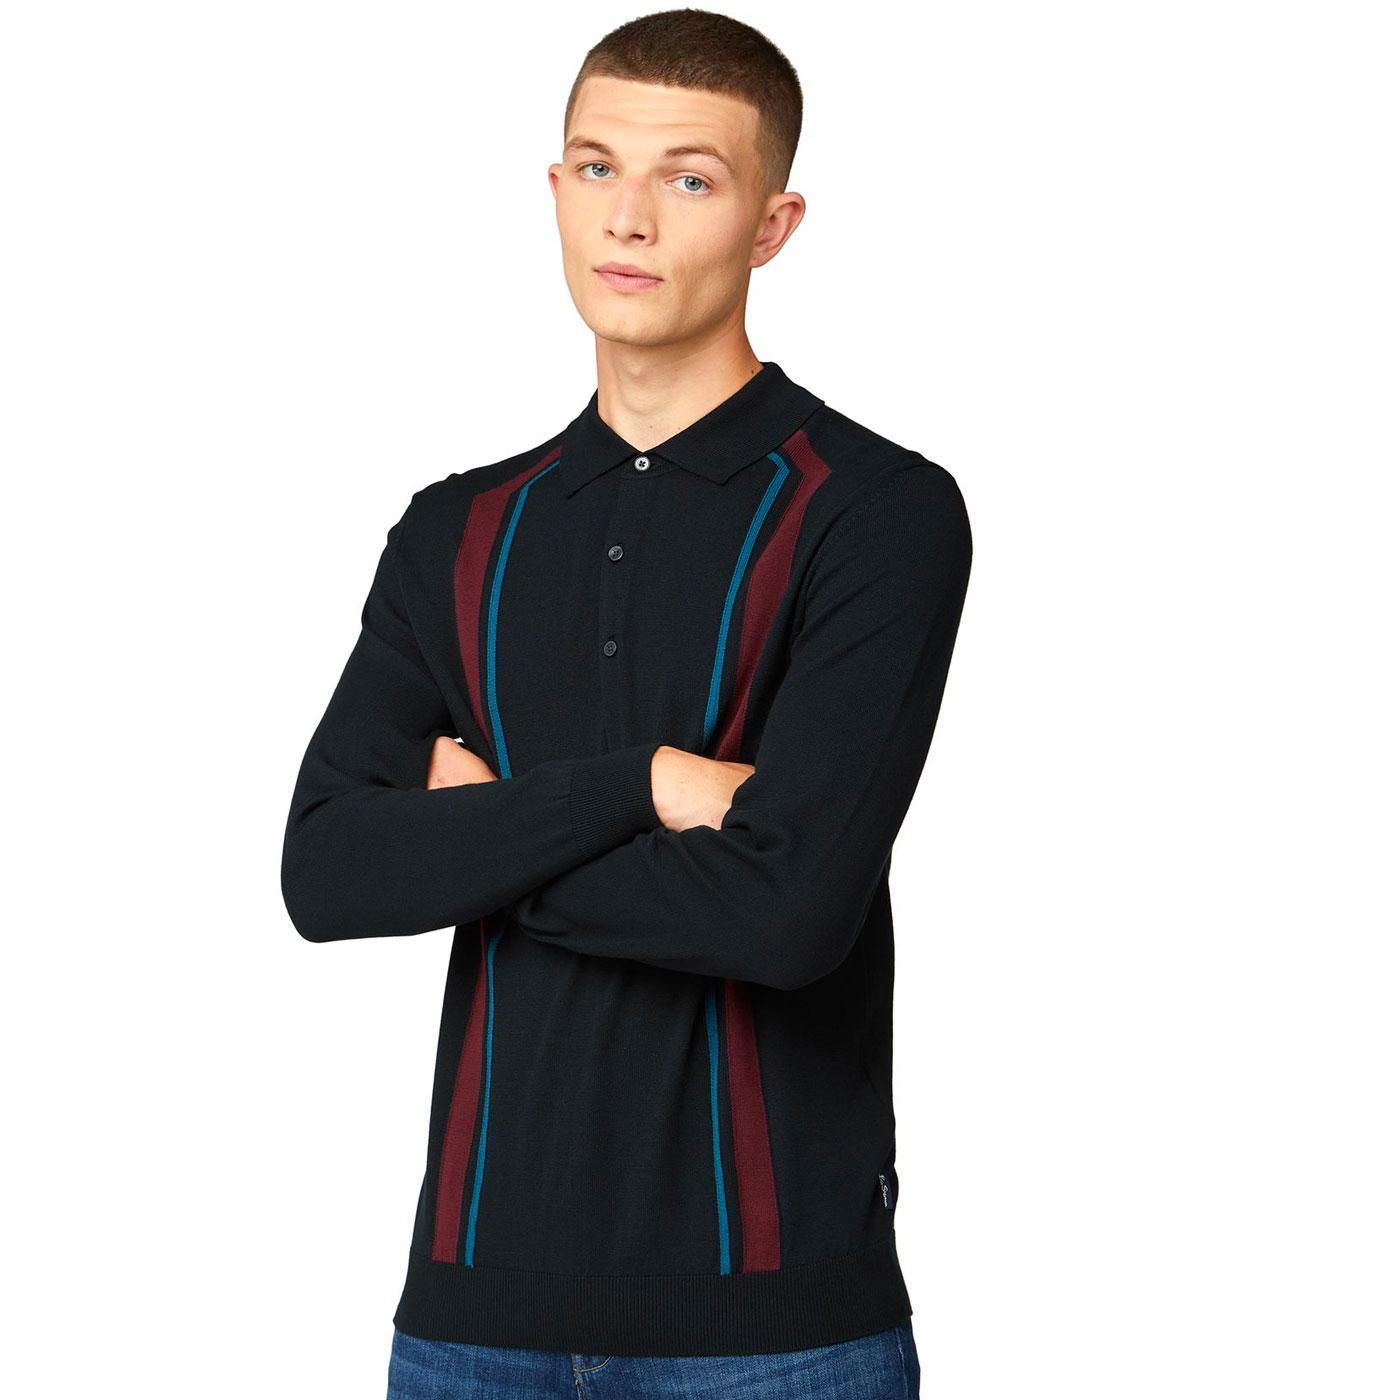 BEN SHERMAN Retro 1960s Long Sleeve Knitted Polo B